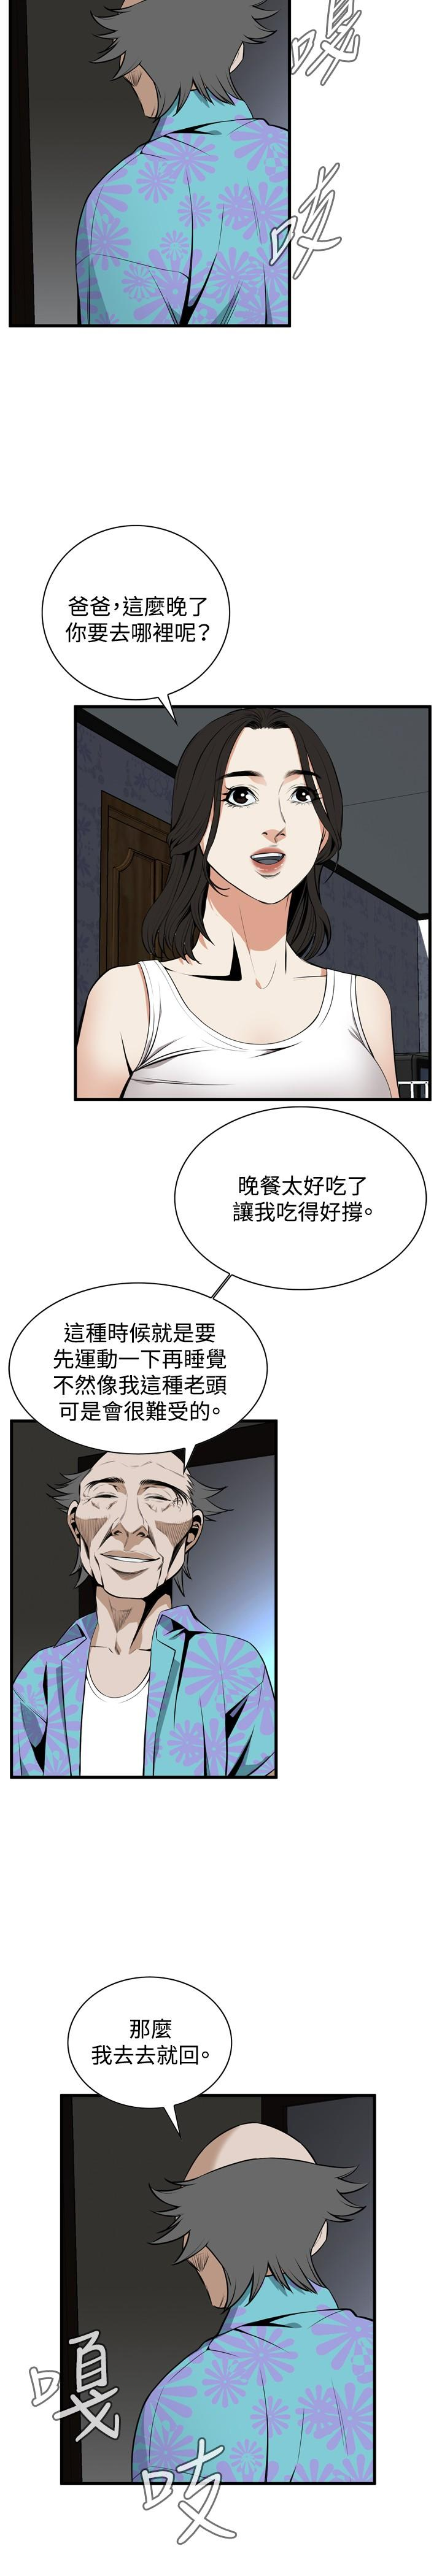 Take a Peek 偷窥 Ch.39~55 [Chinese]中文 141